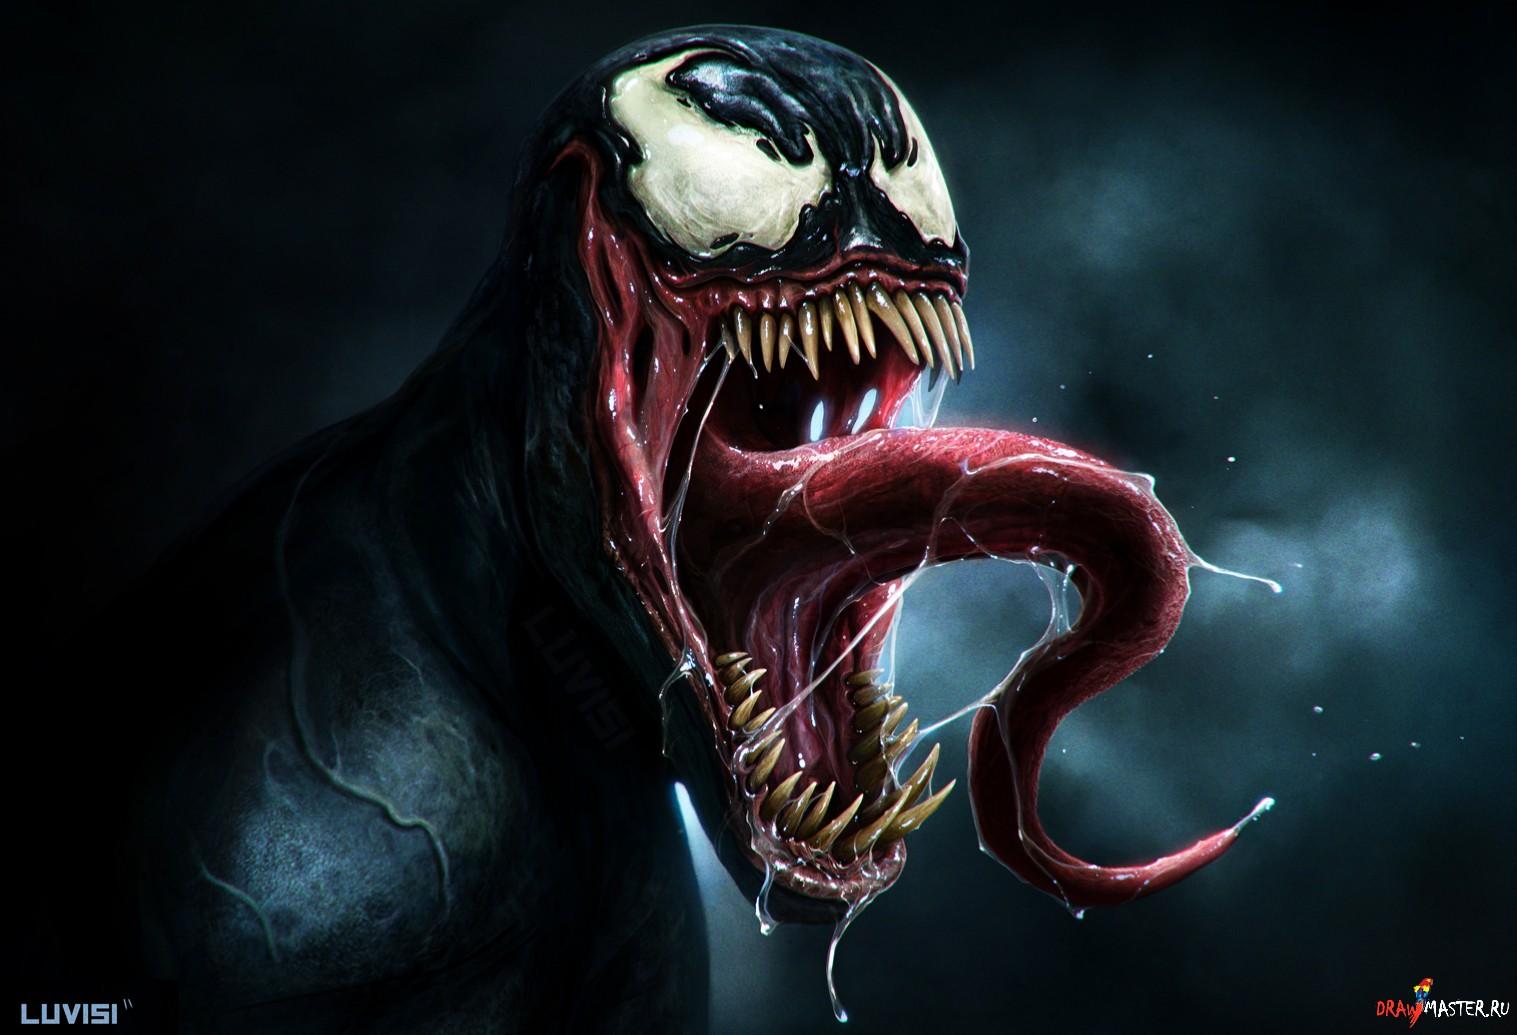 ��� ���������� ��������� ������� <strong>�������</strong>-<strong>����</strong> � ������ (Venom <strong>...</strong>